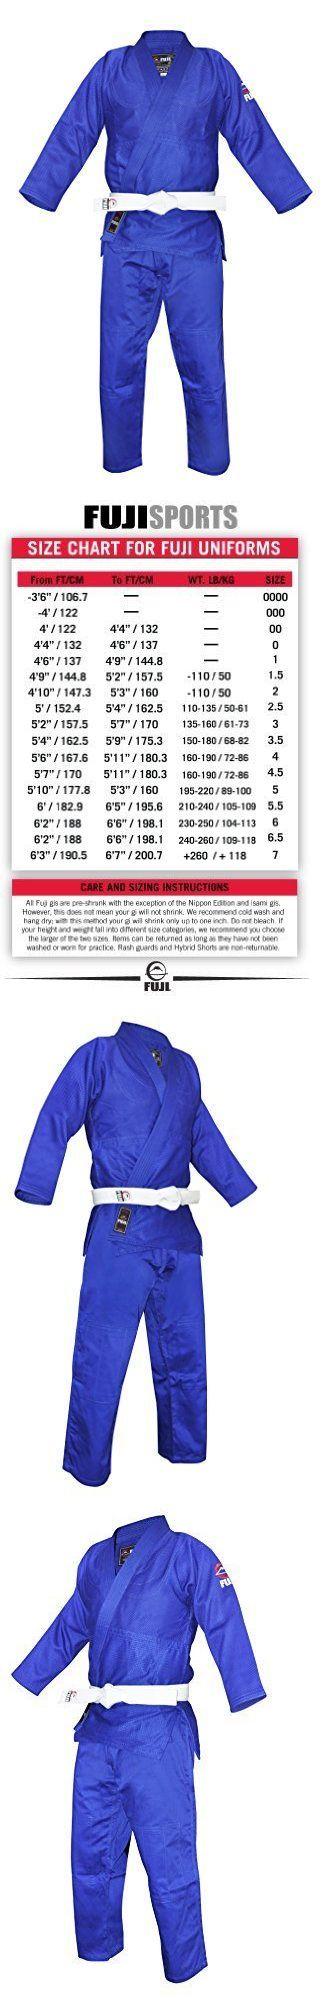 Jackets 179771: Fuji Single Weave Judo Gi Blue 4 Mens Martial Arts Uniform Jacket, New -> BUY IT NOW ONLY: $73.15 on eBay!